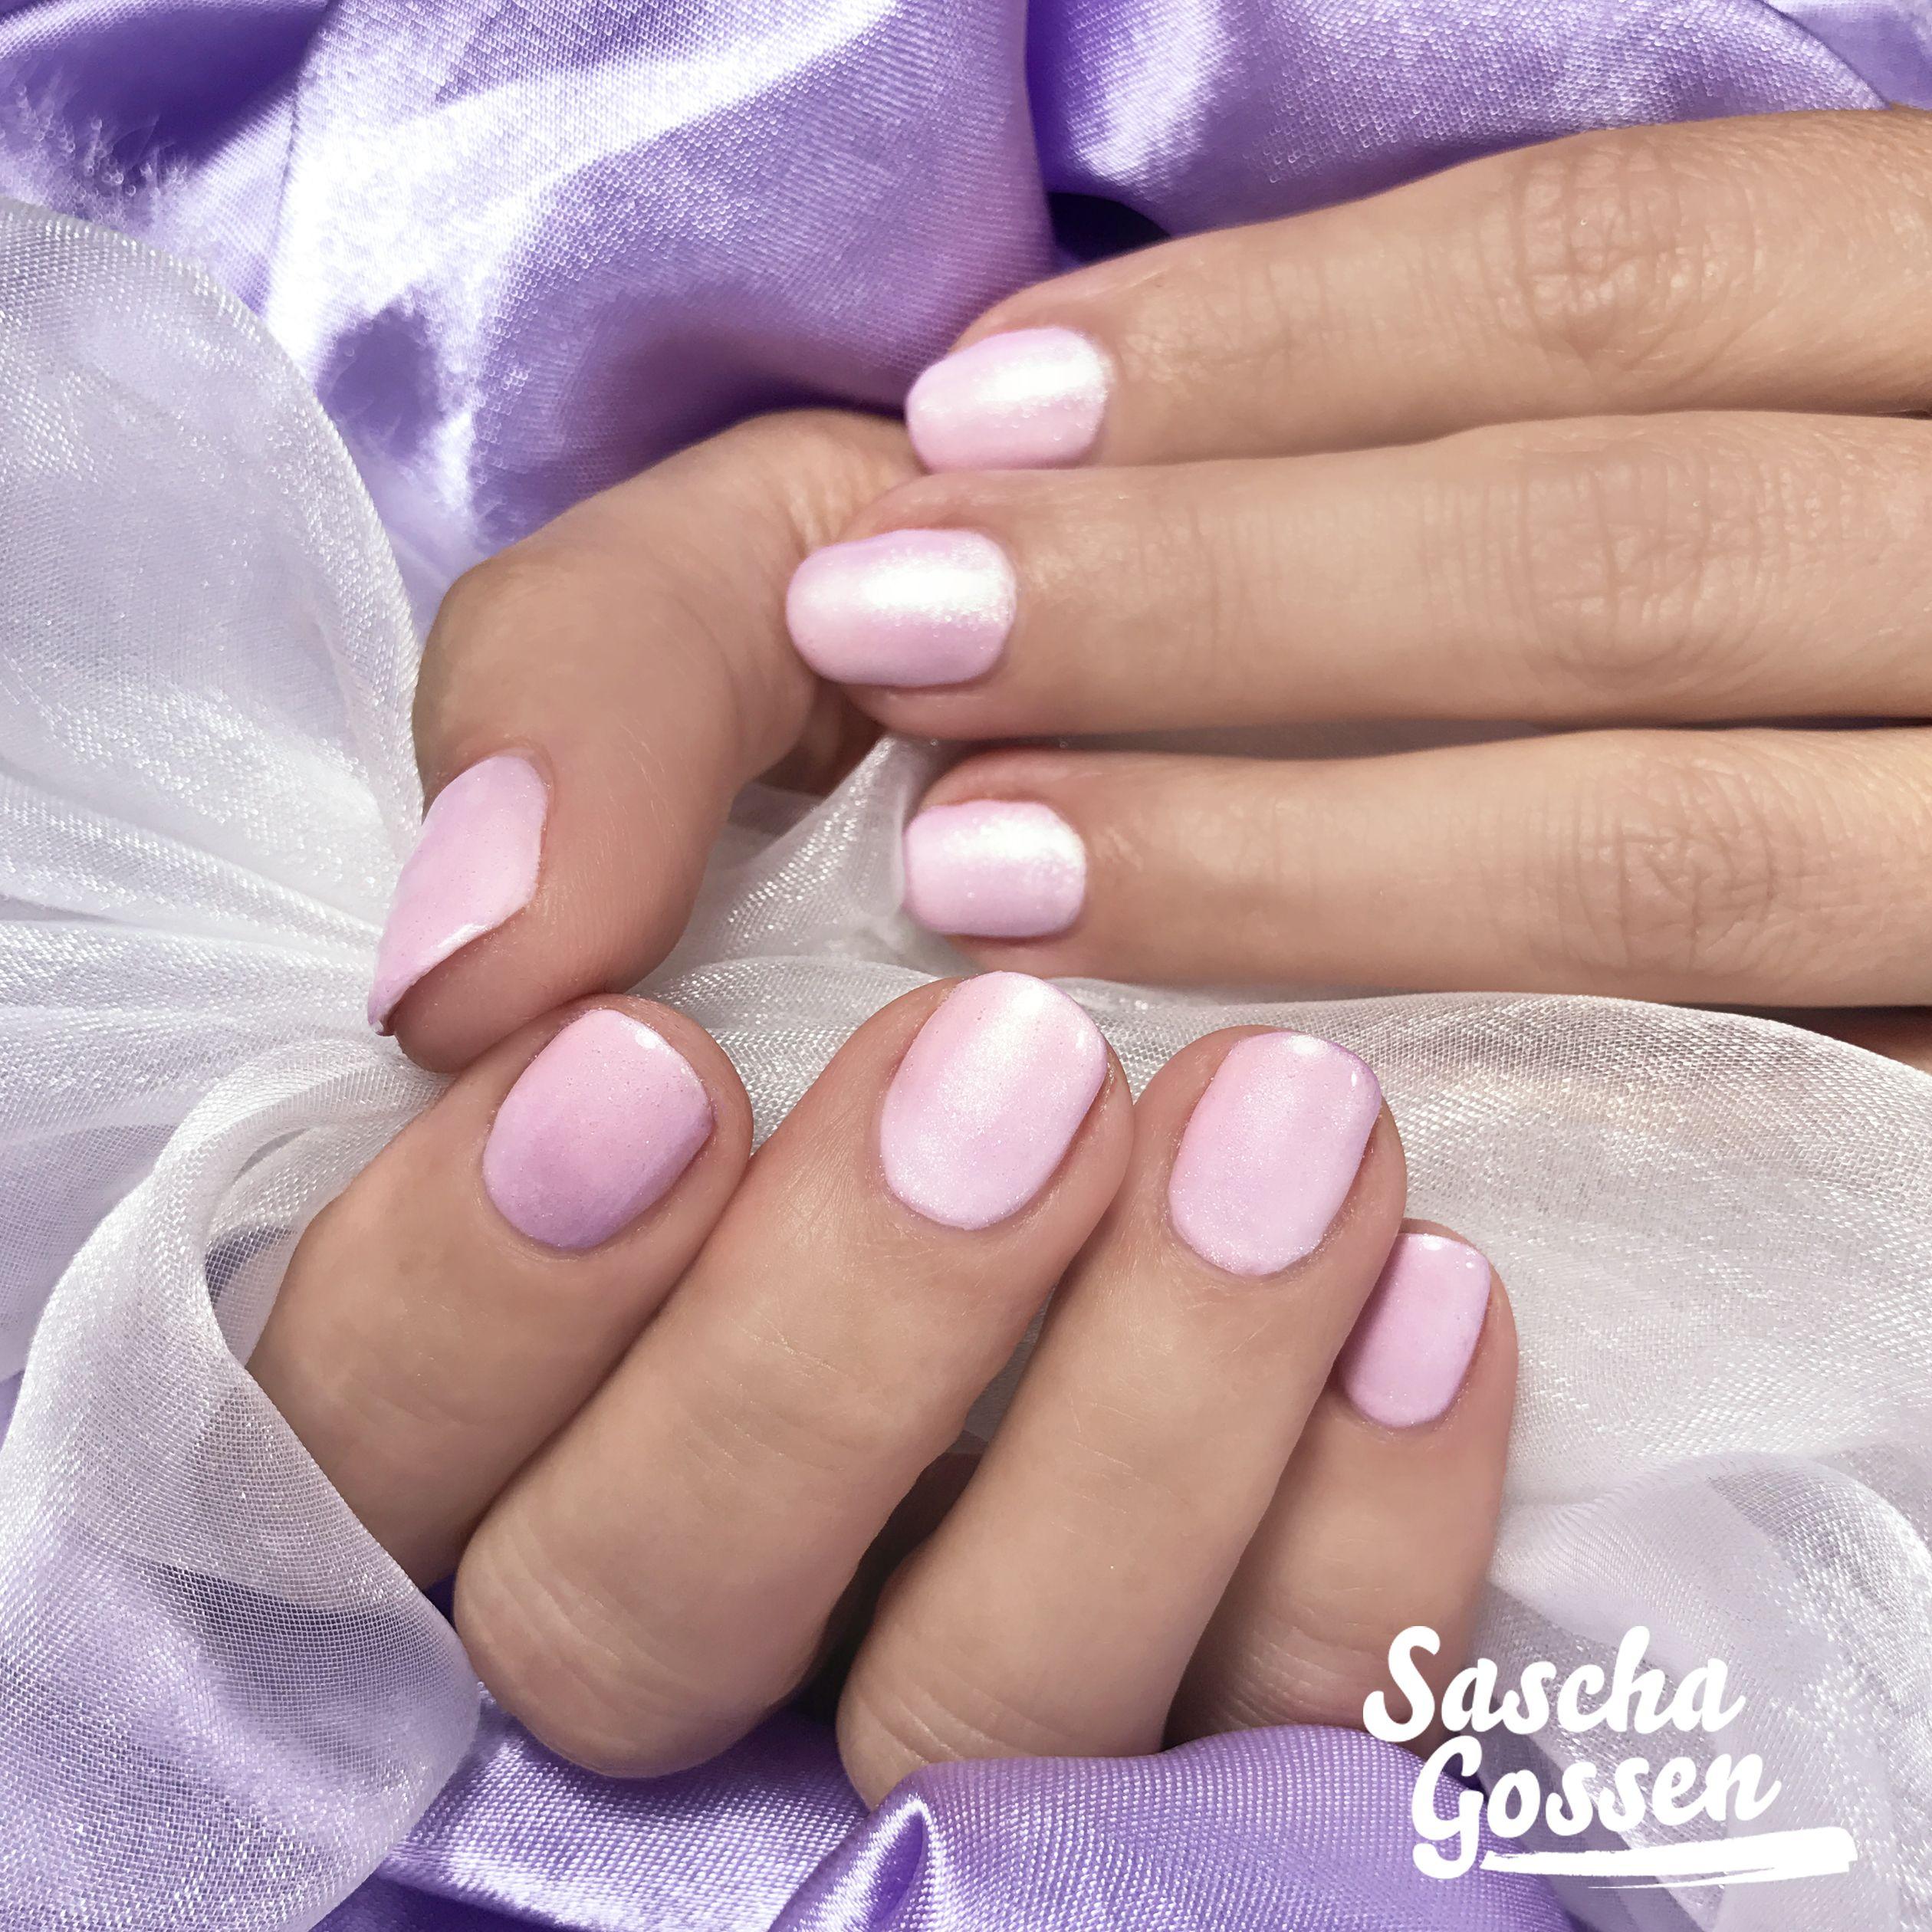 Shiny Pink Natural Nails With Cnd Shellac Winter Glow And Cnd Additives Nectar Glaze Nails2inspire Instanails Inspirat Cnd Nails Swag Nails Pink Nails